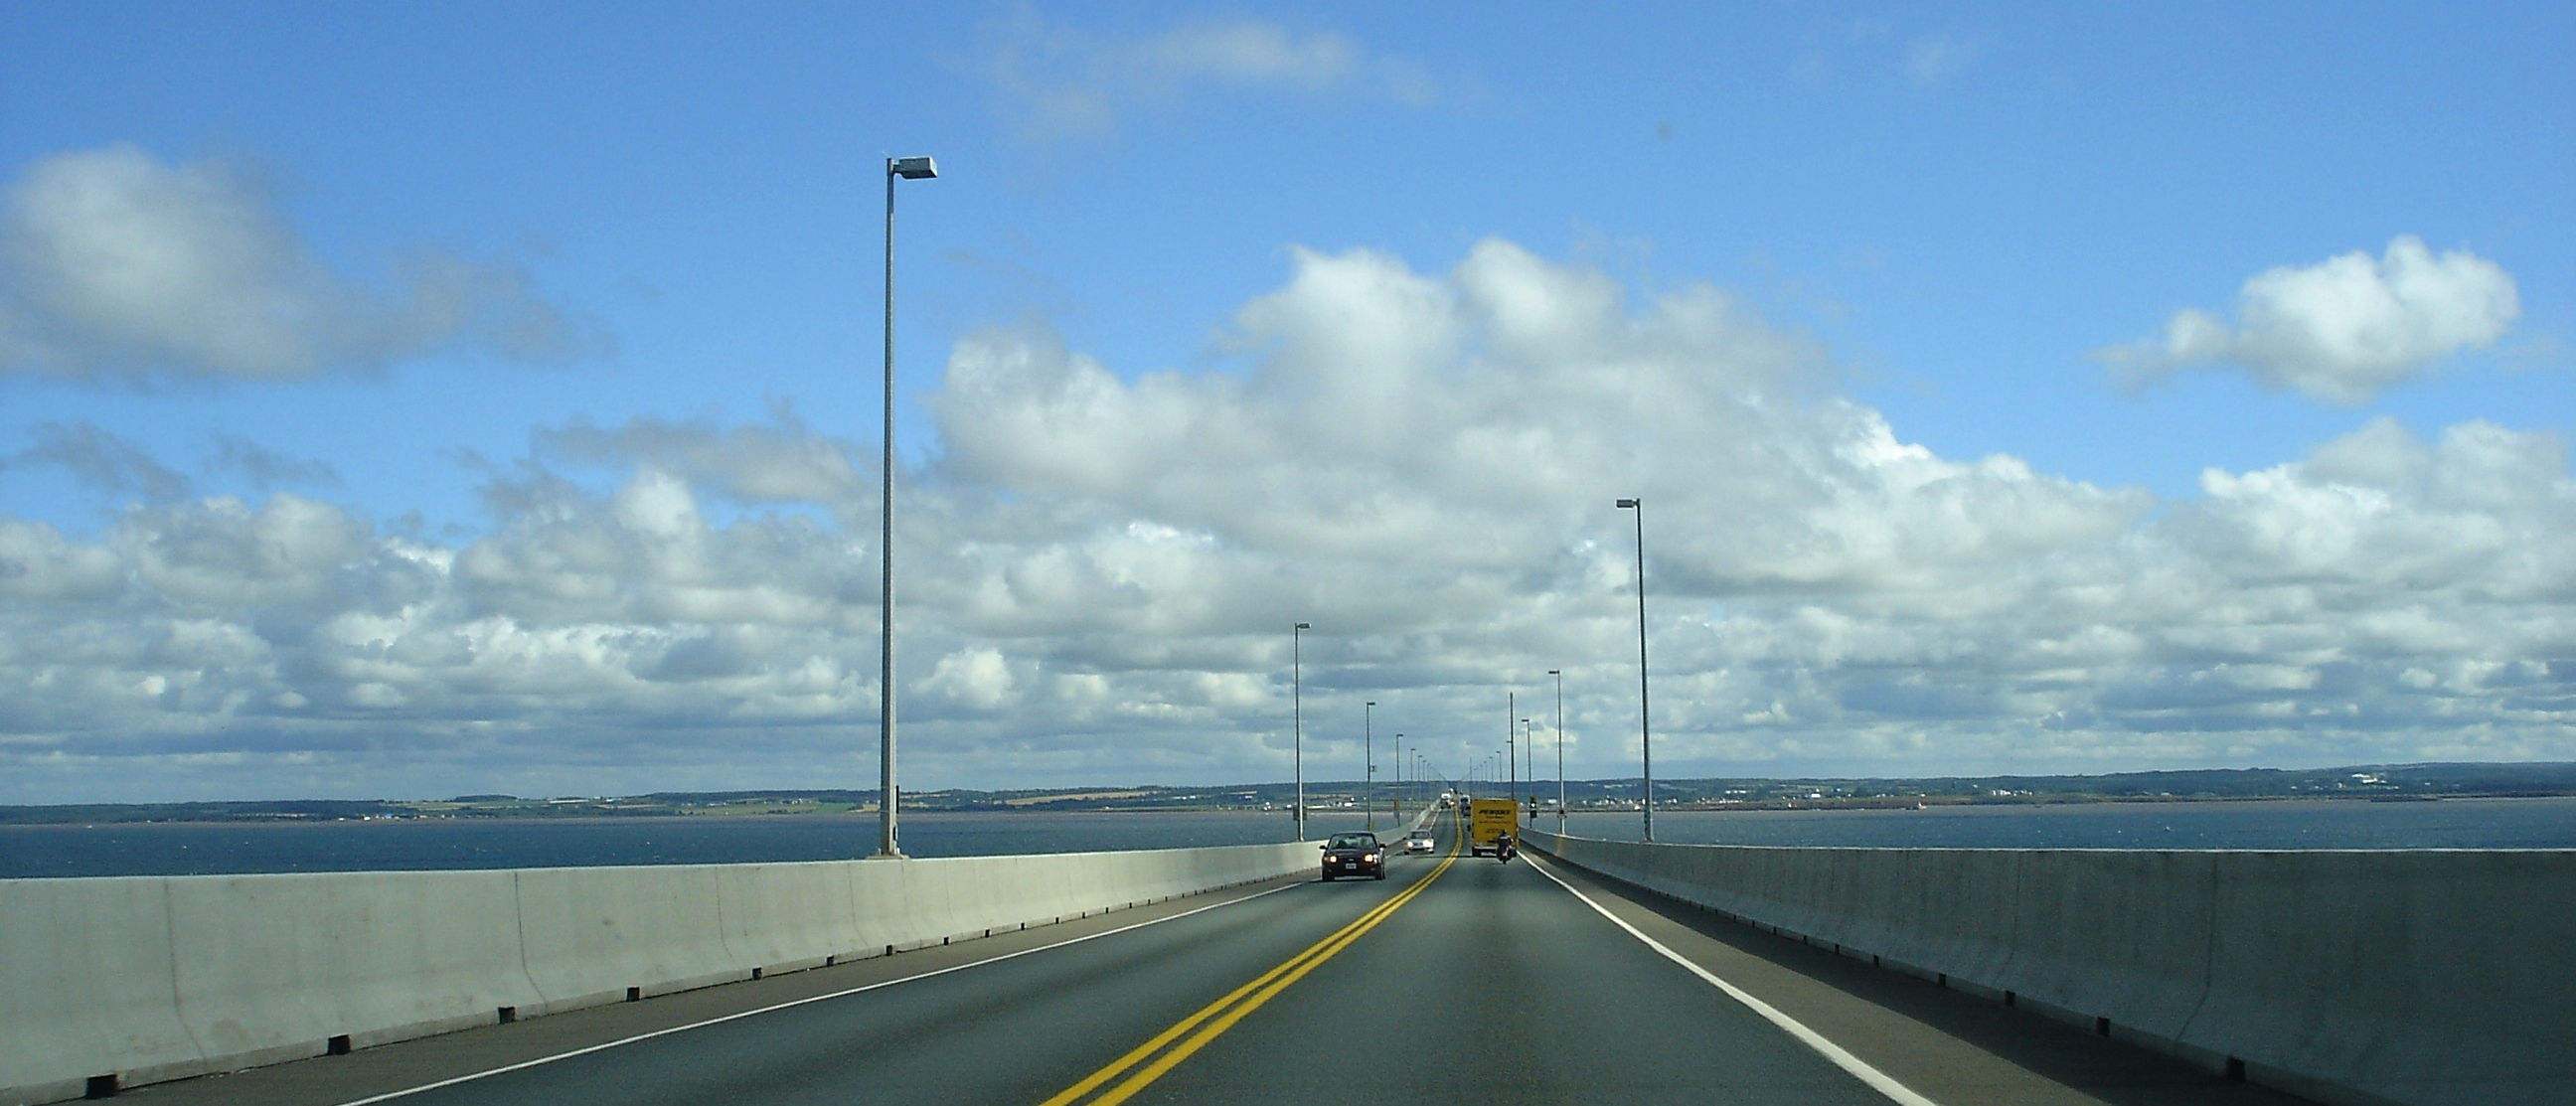 Prince Edward Island Bridge Toll